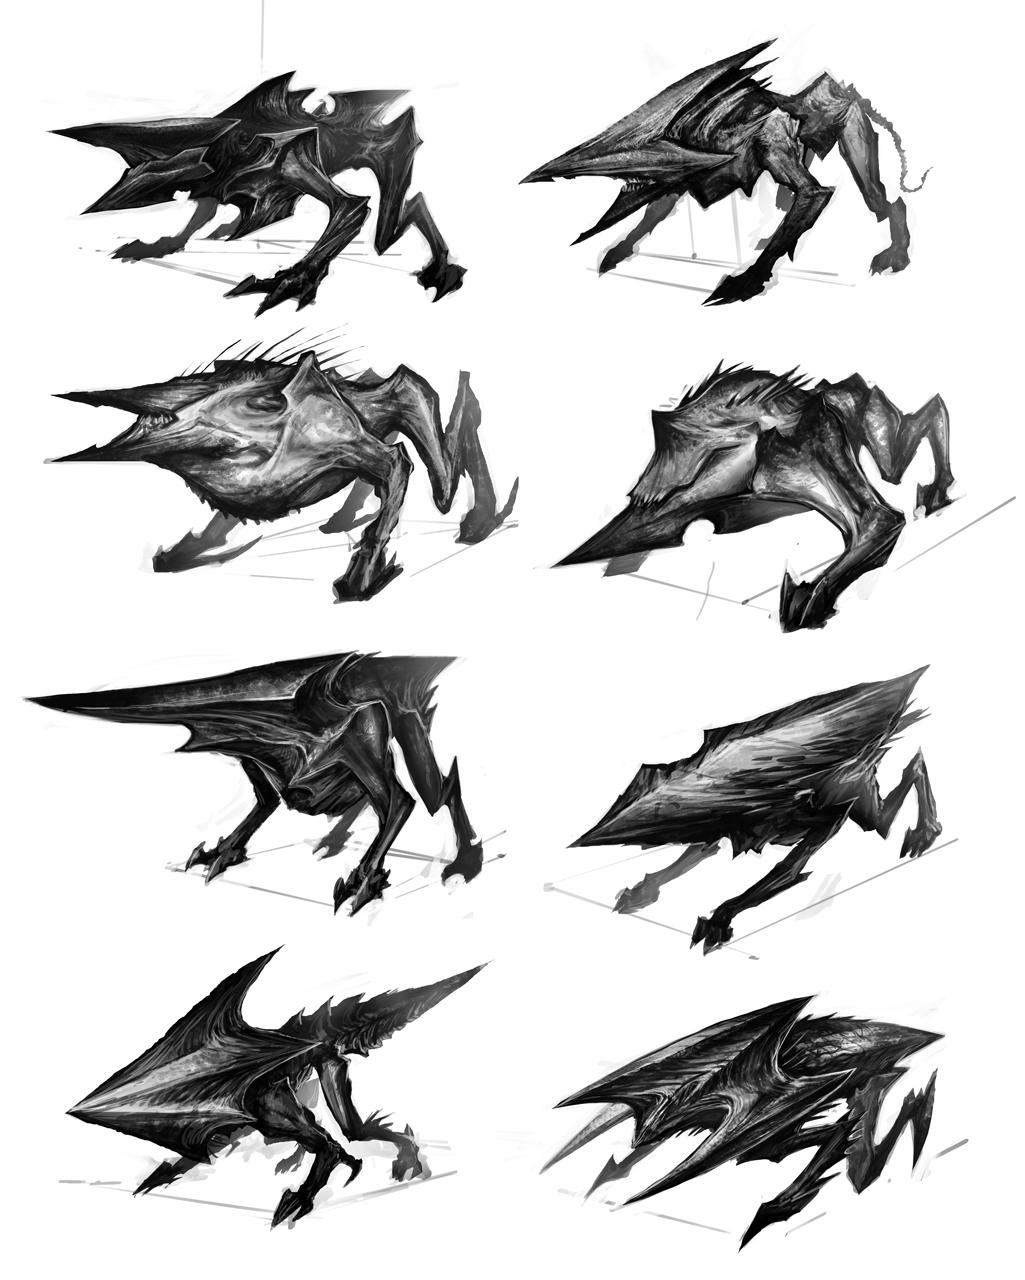 creature_thumbs.jpg